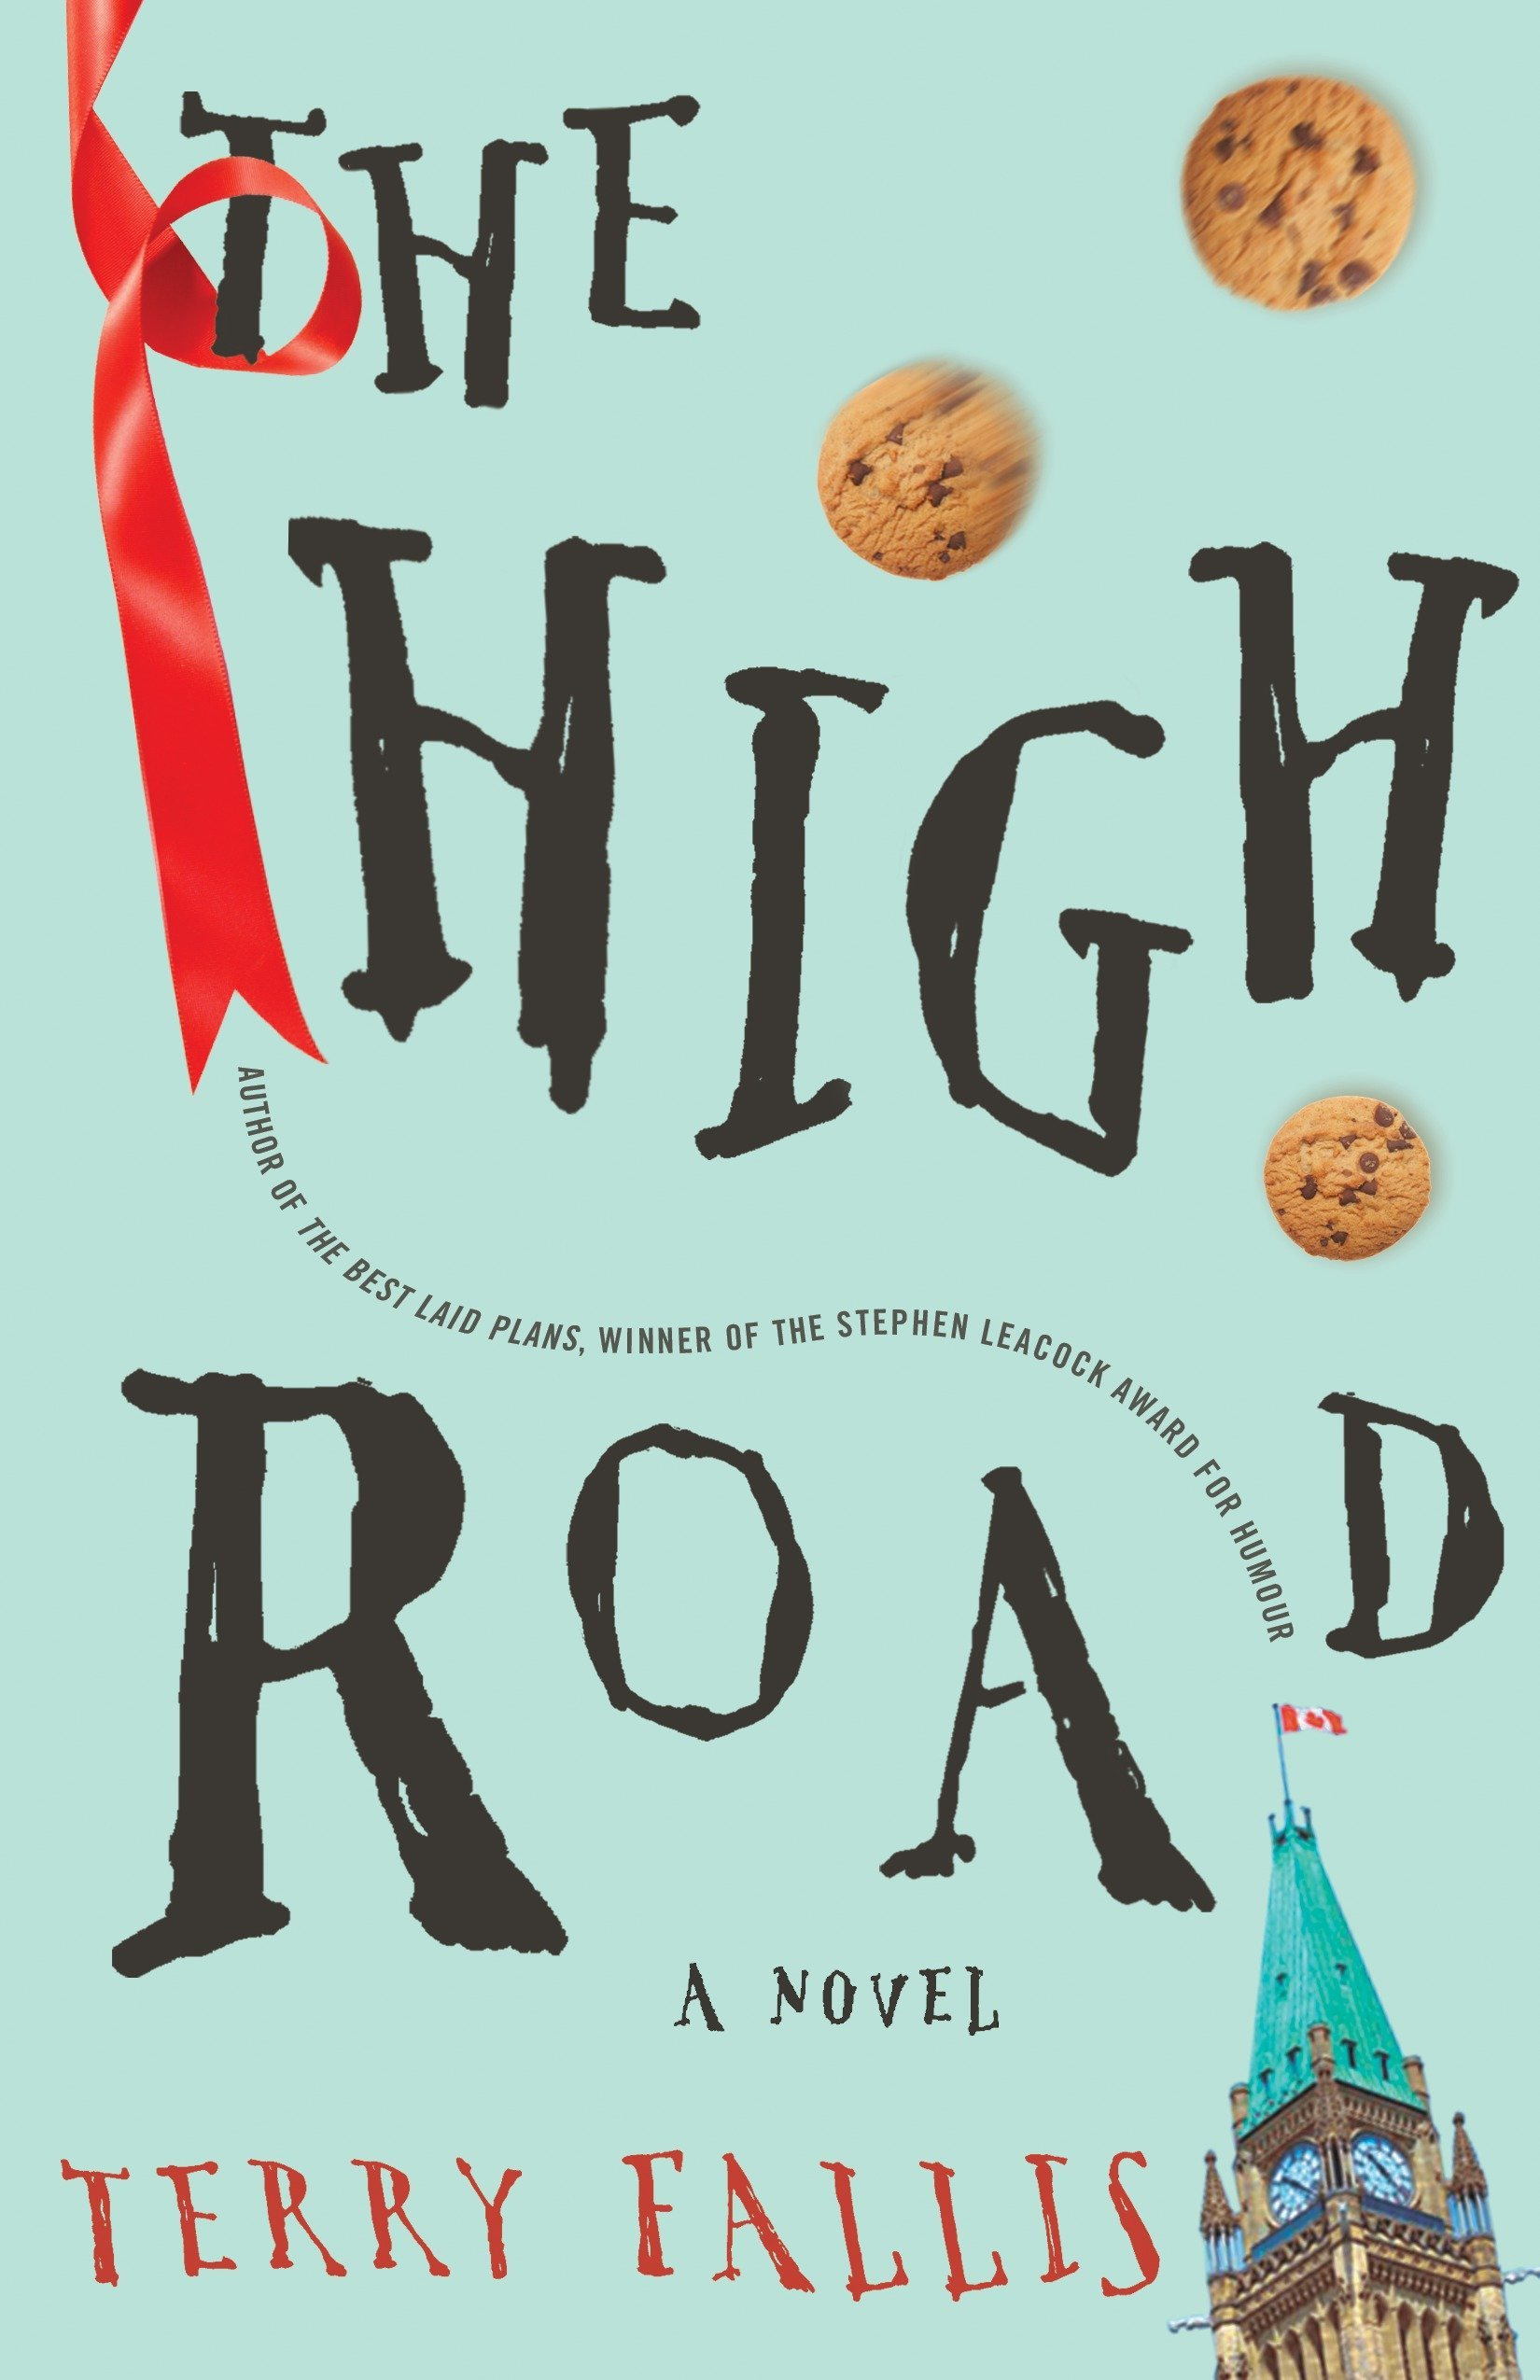 The High Road: Terry Fallis: 8601400616284: Amazon.com: Books